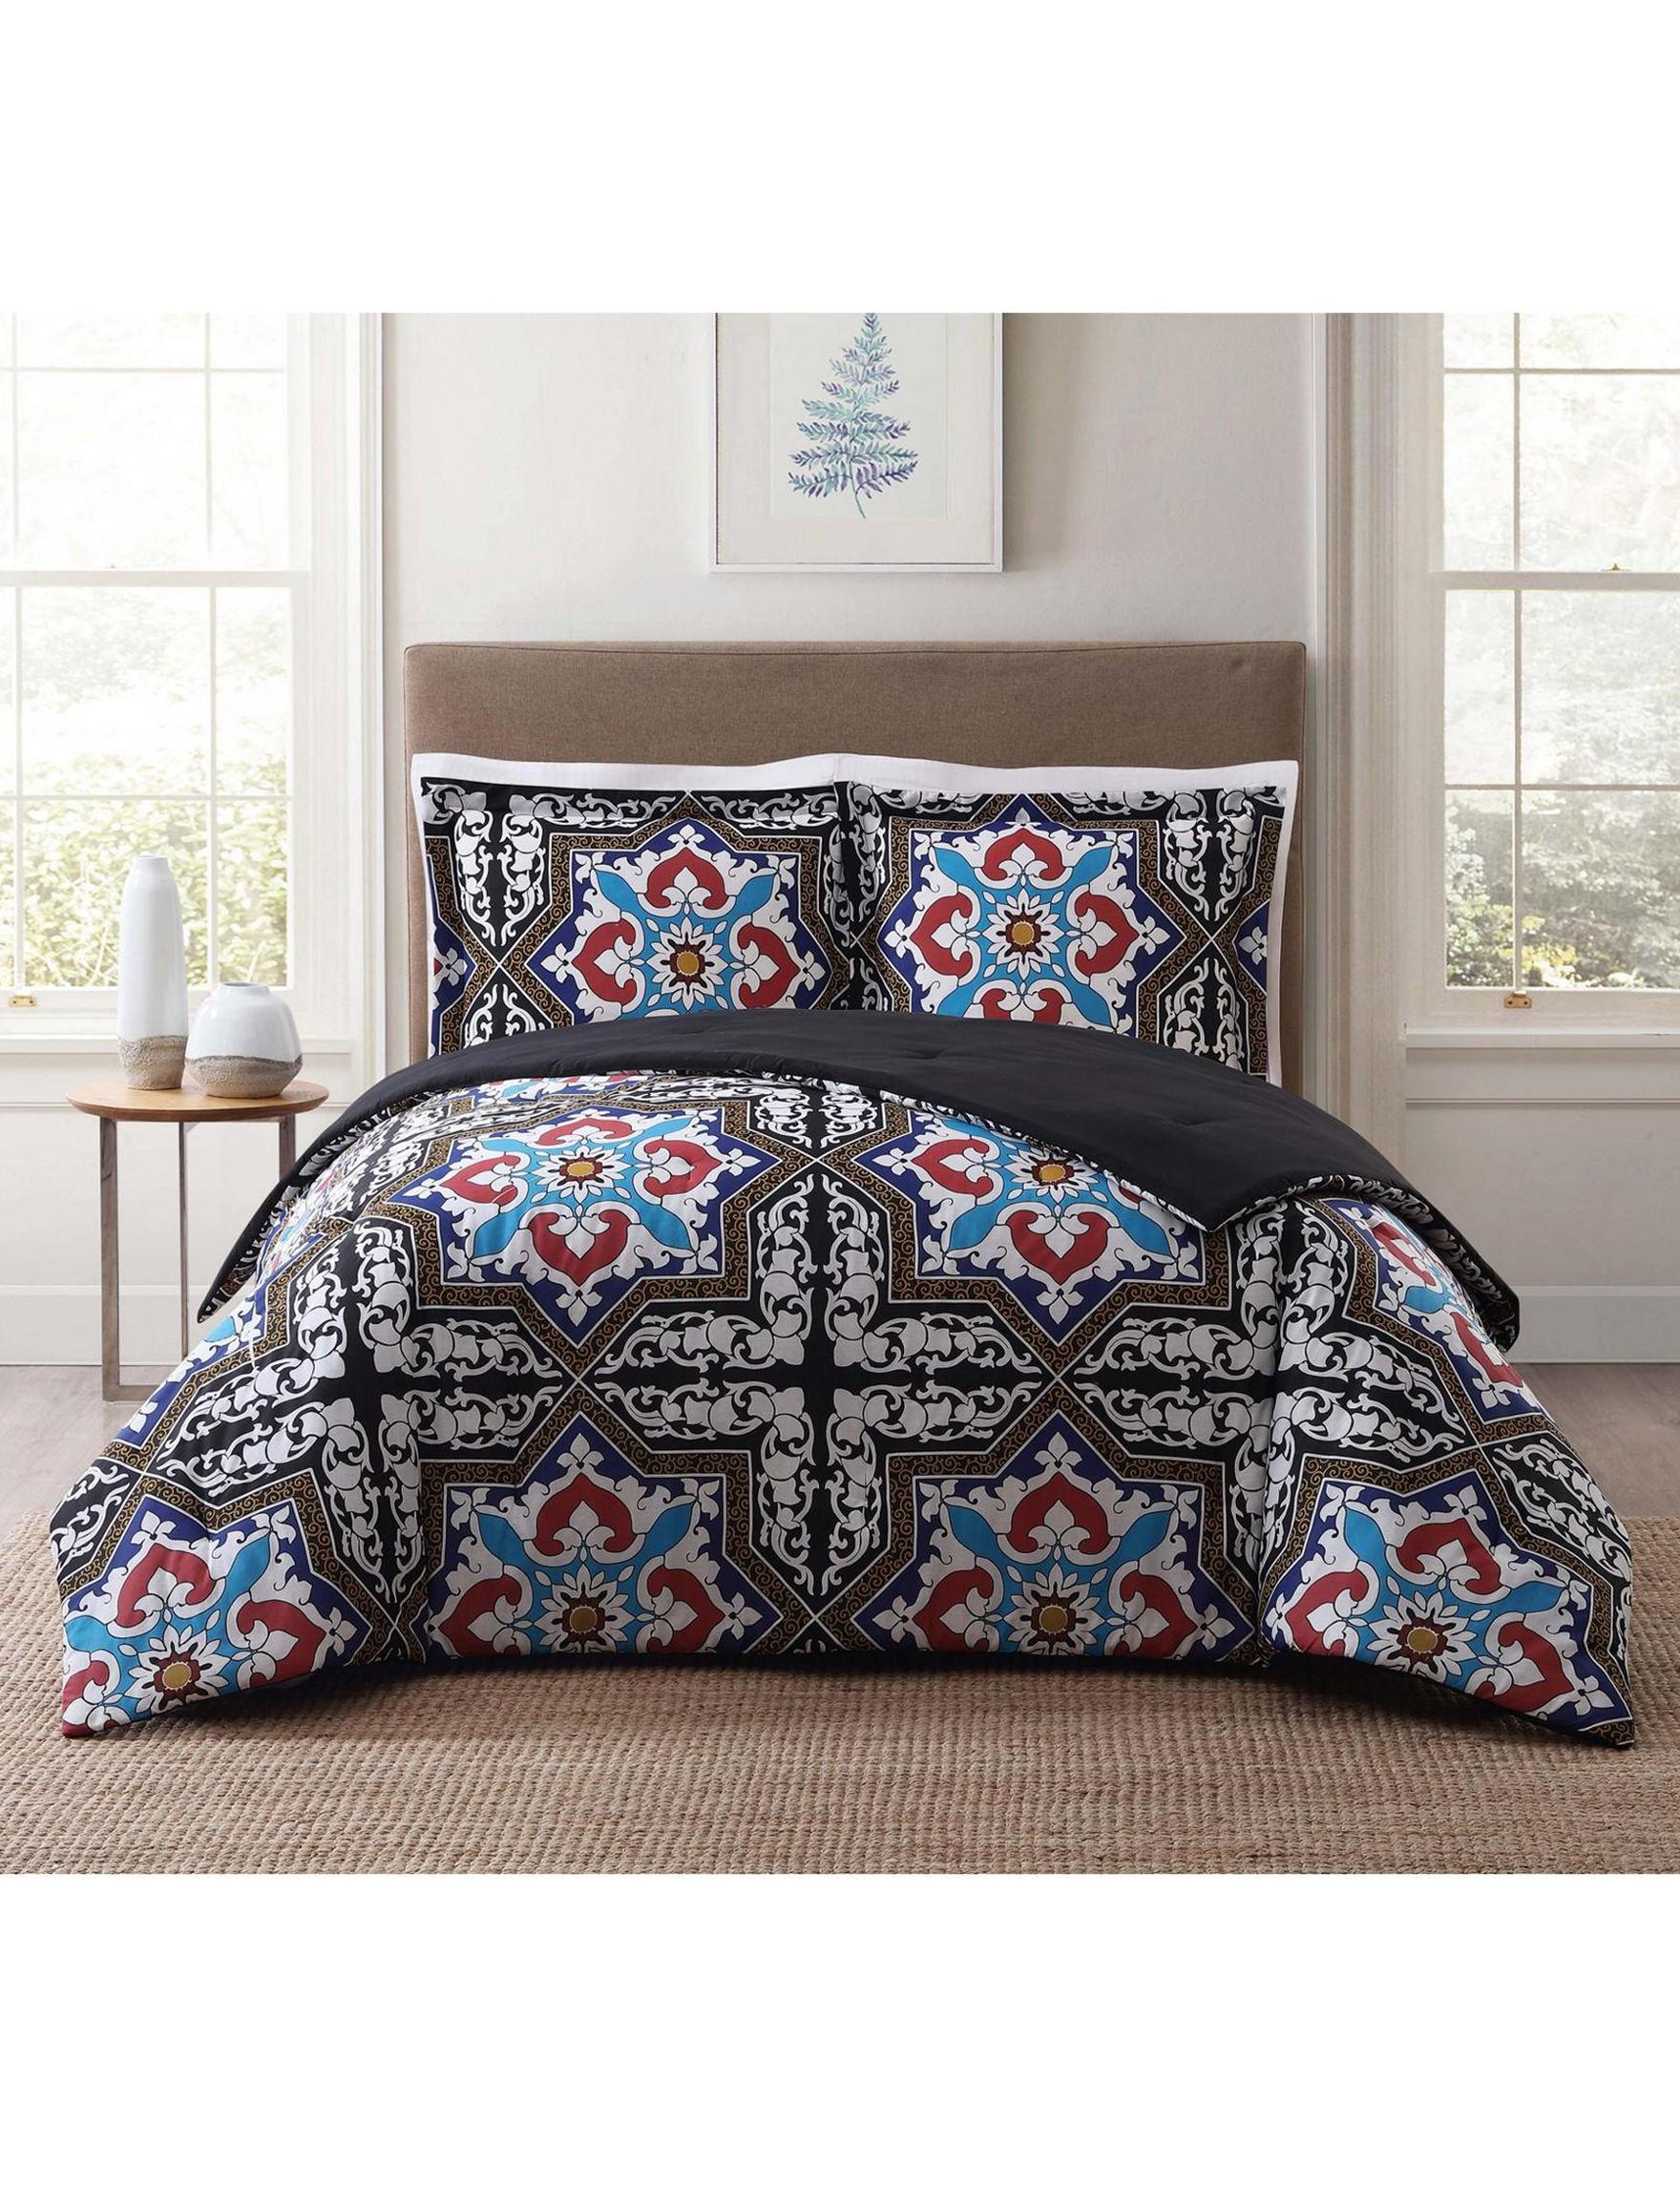 Style 212 Blue / Black Comforters & Comforter Sets